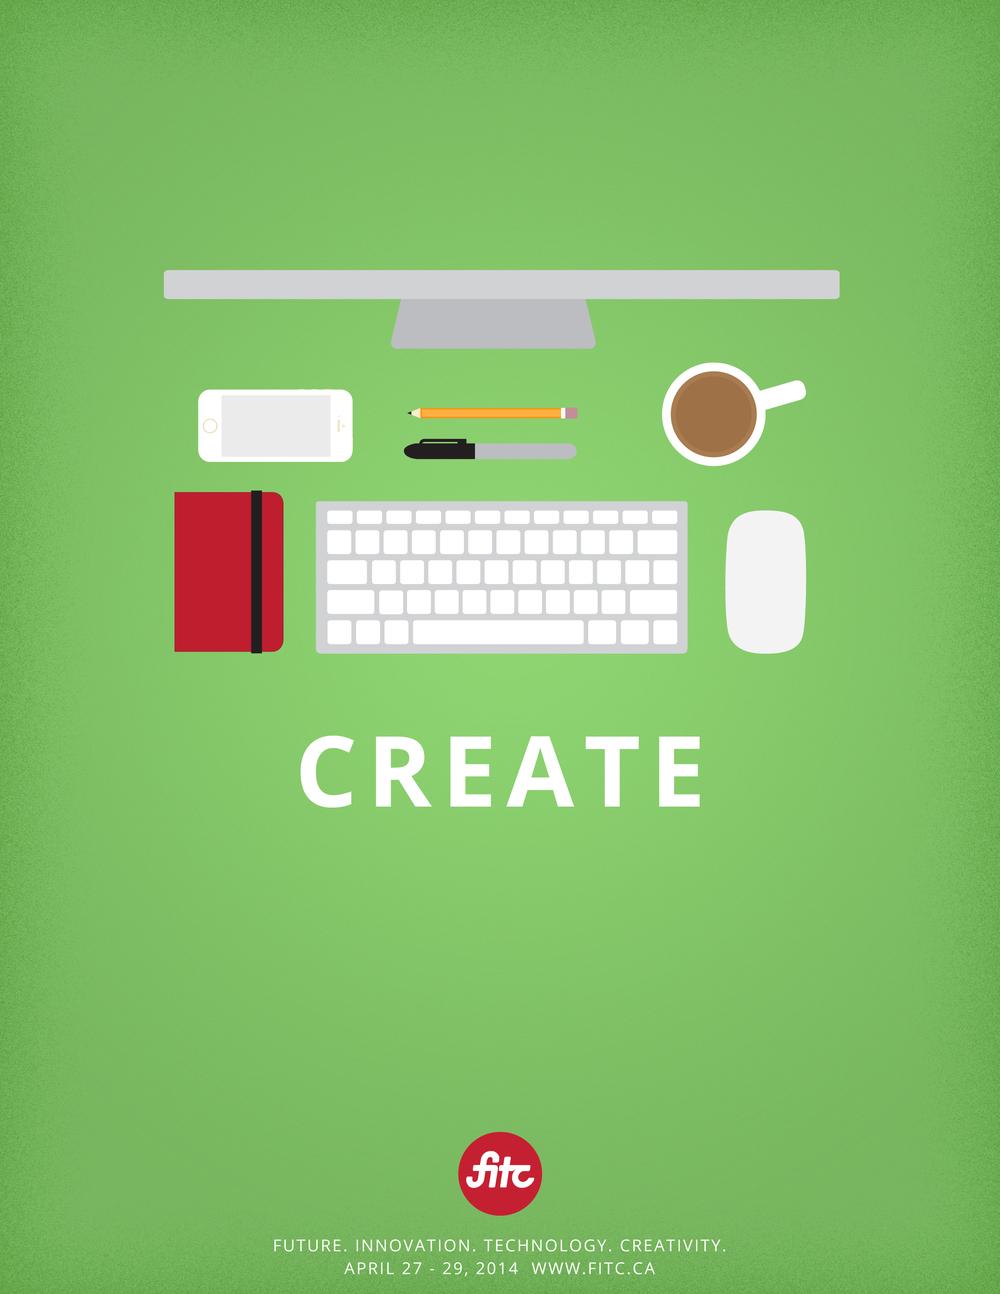 fitc_create.jpg